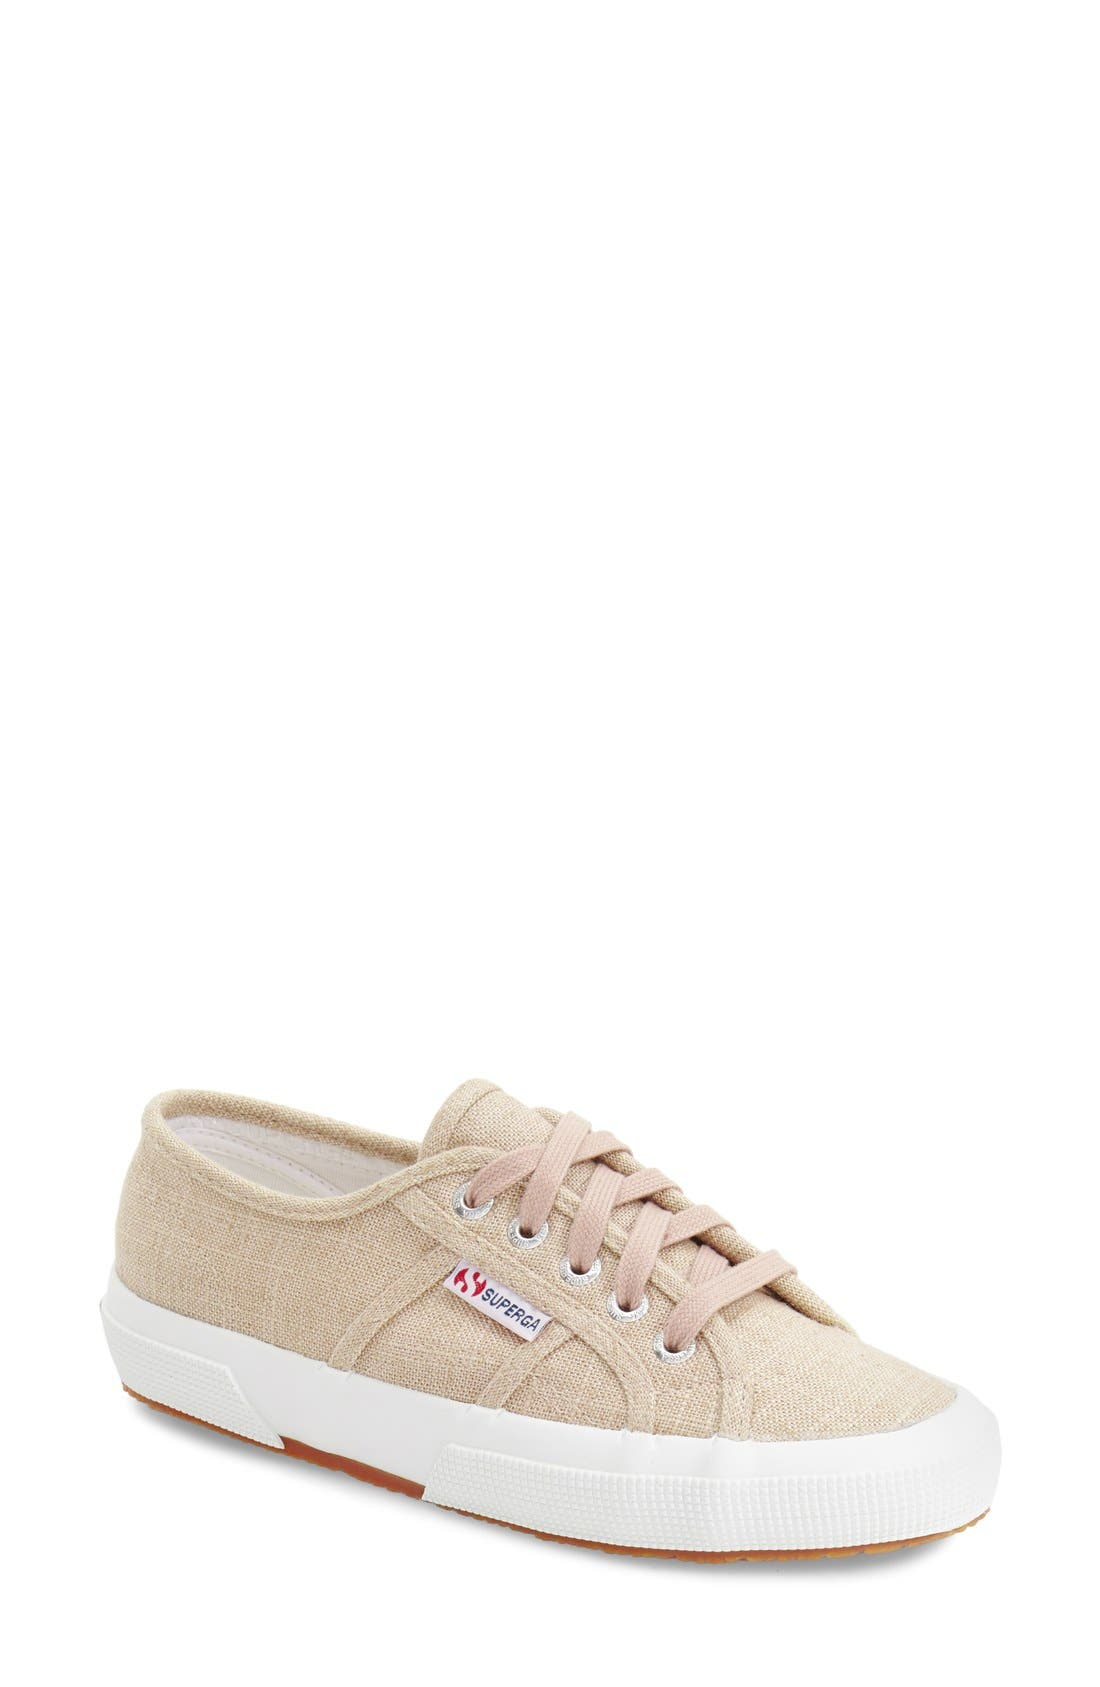 'Linu' Linen Sneaker ...